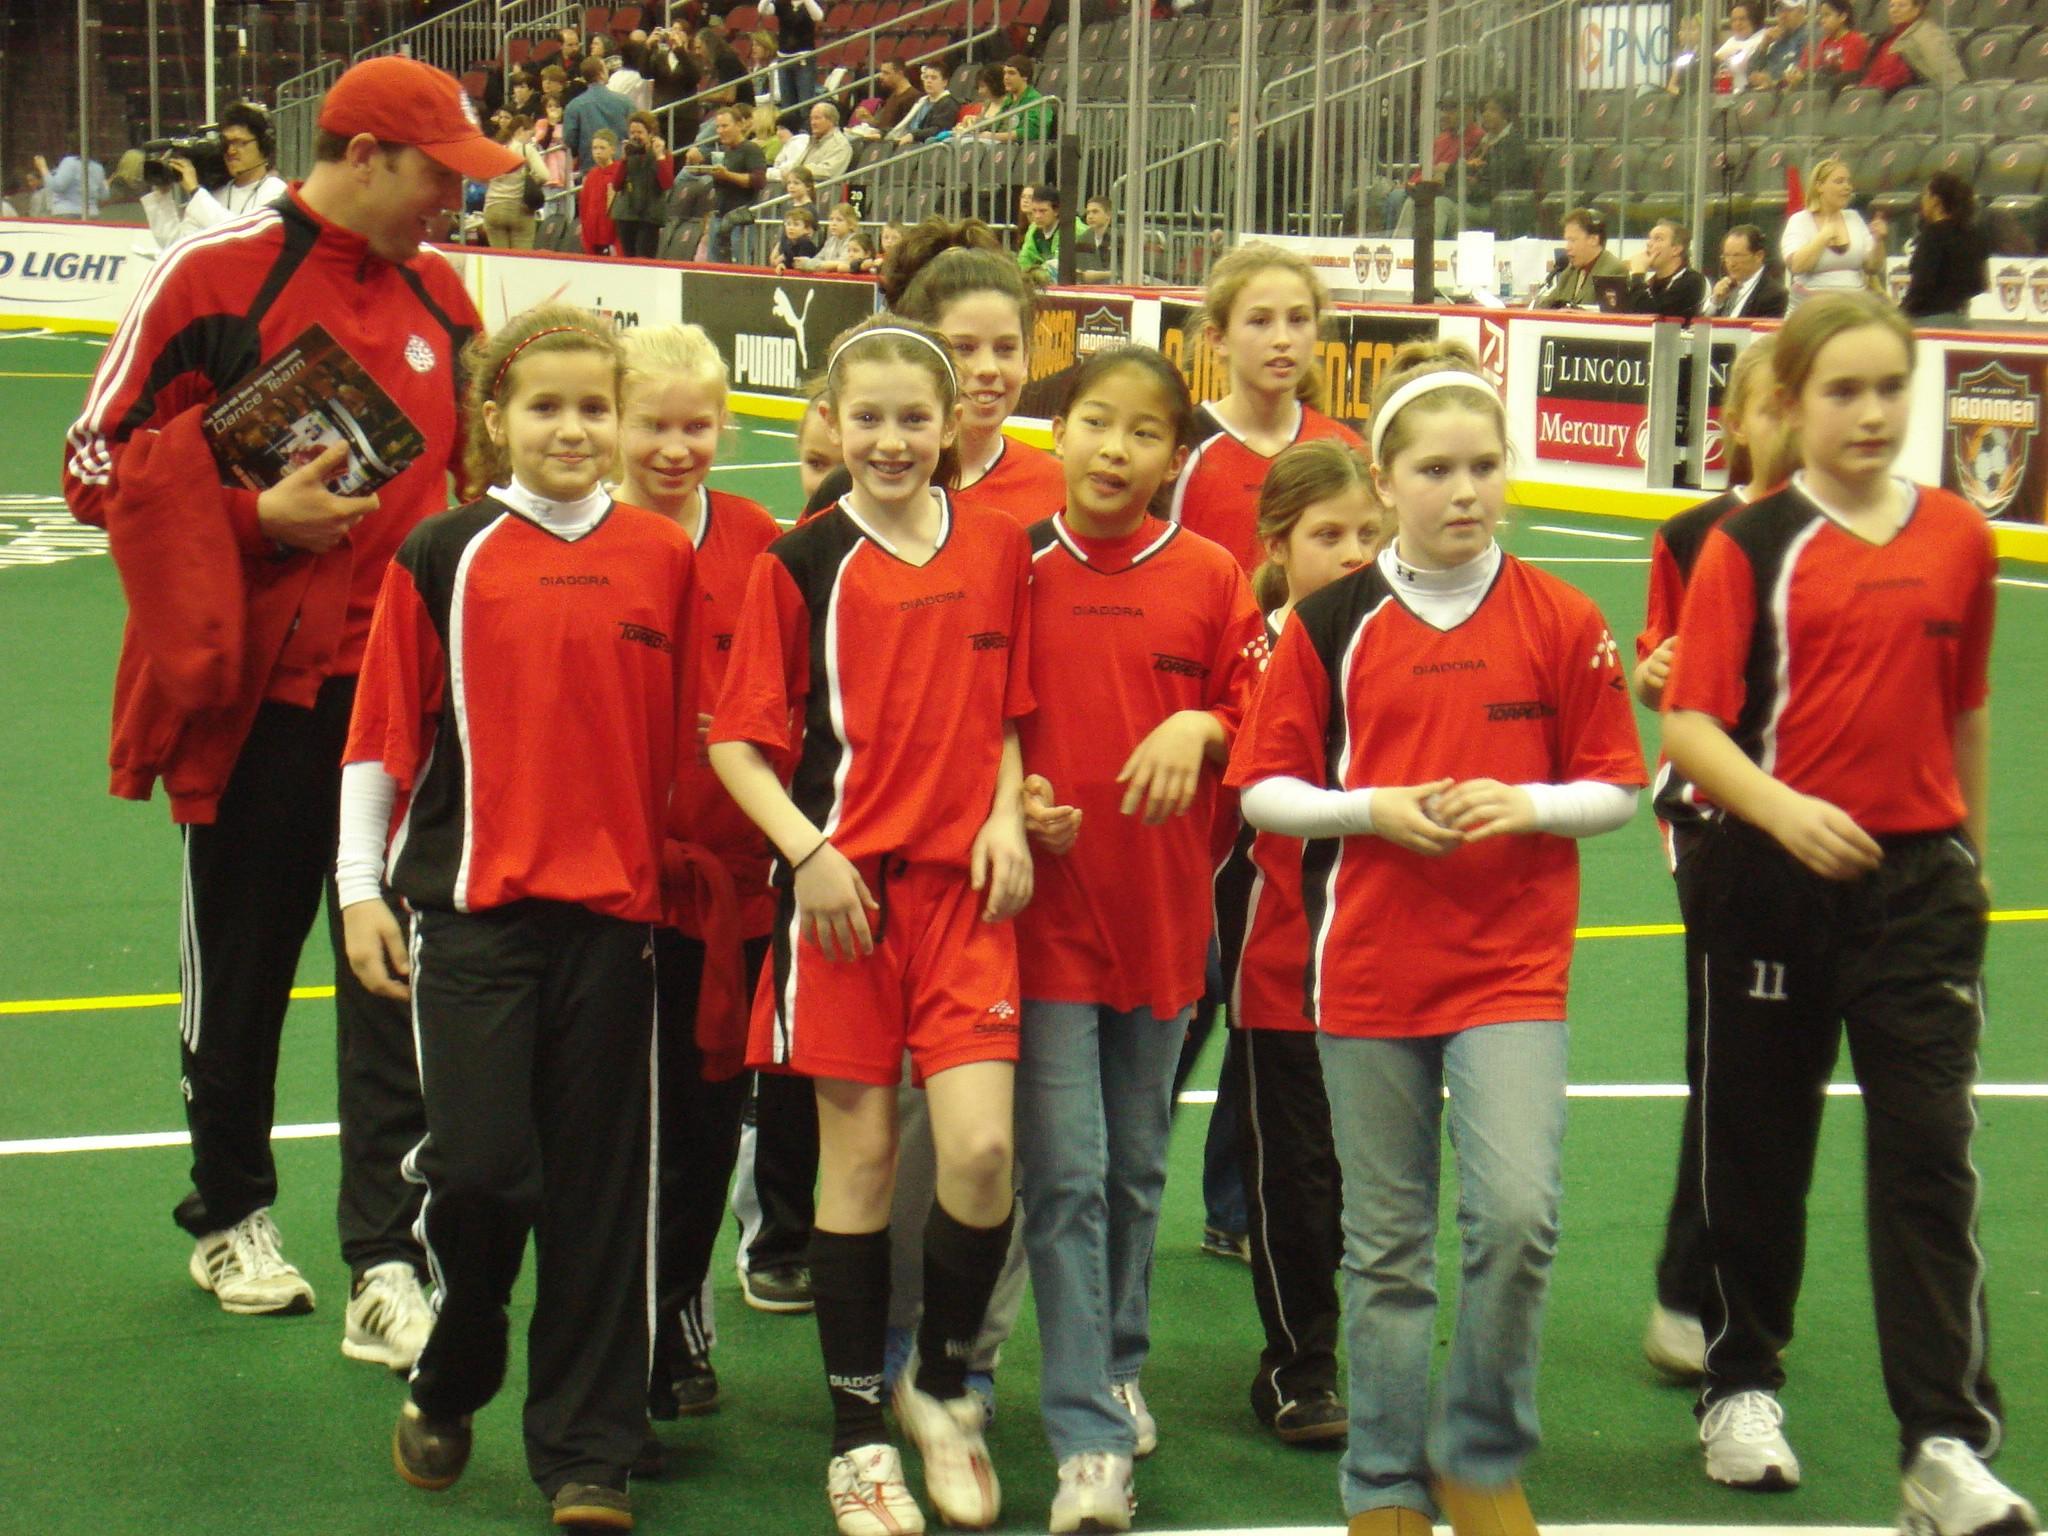 nasa soccer girls - photo #44